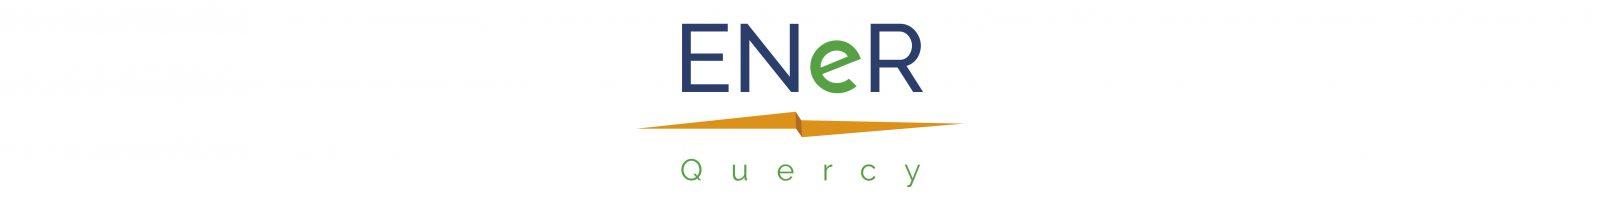 Ener-quercy